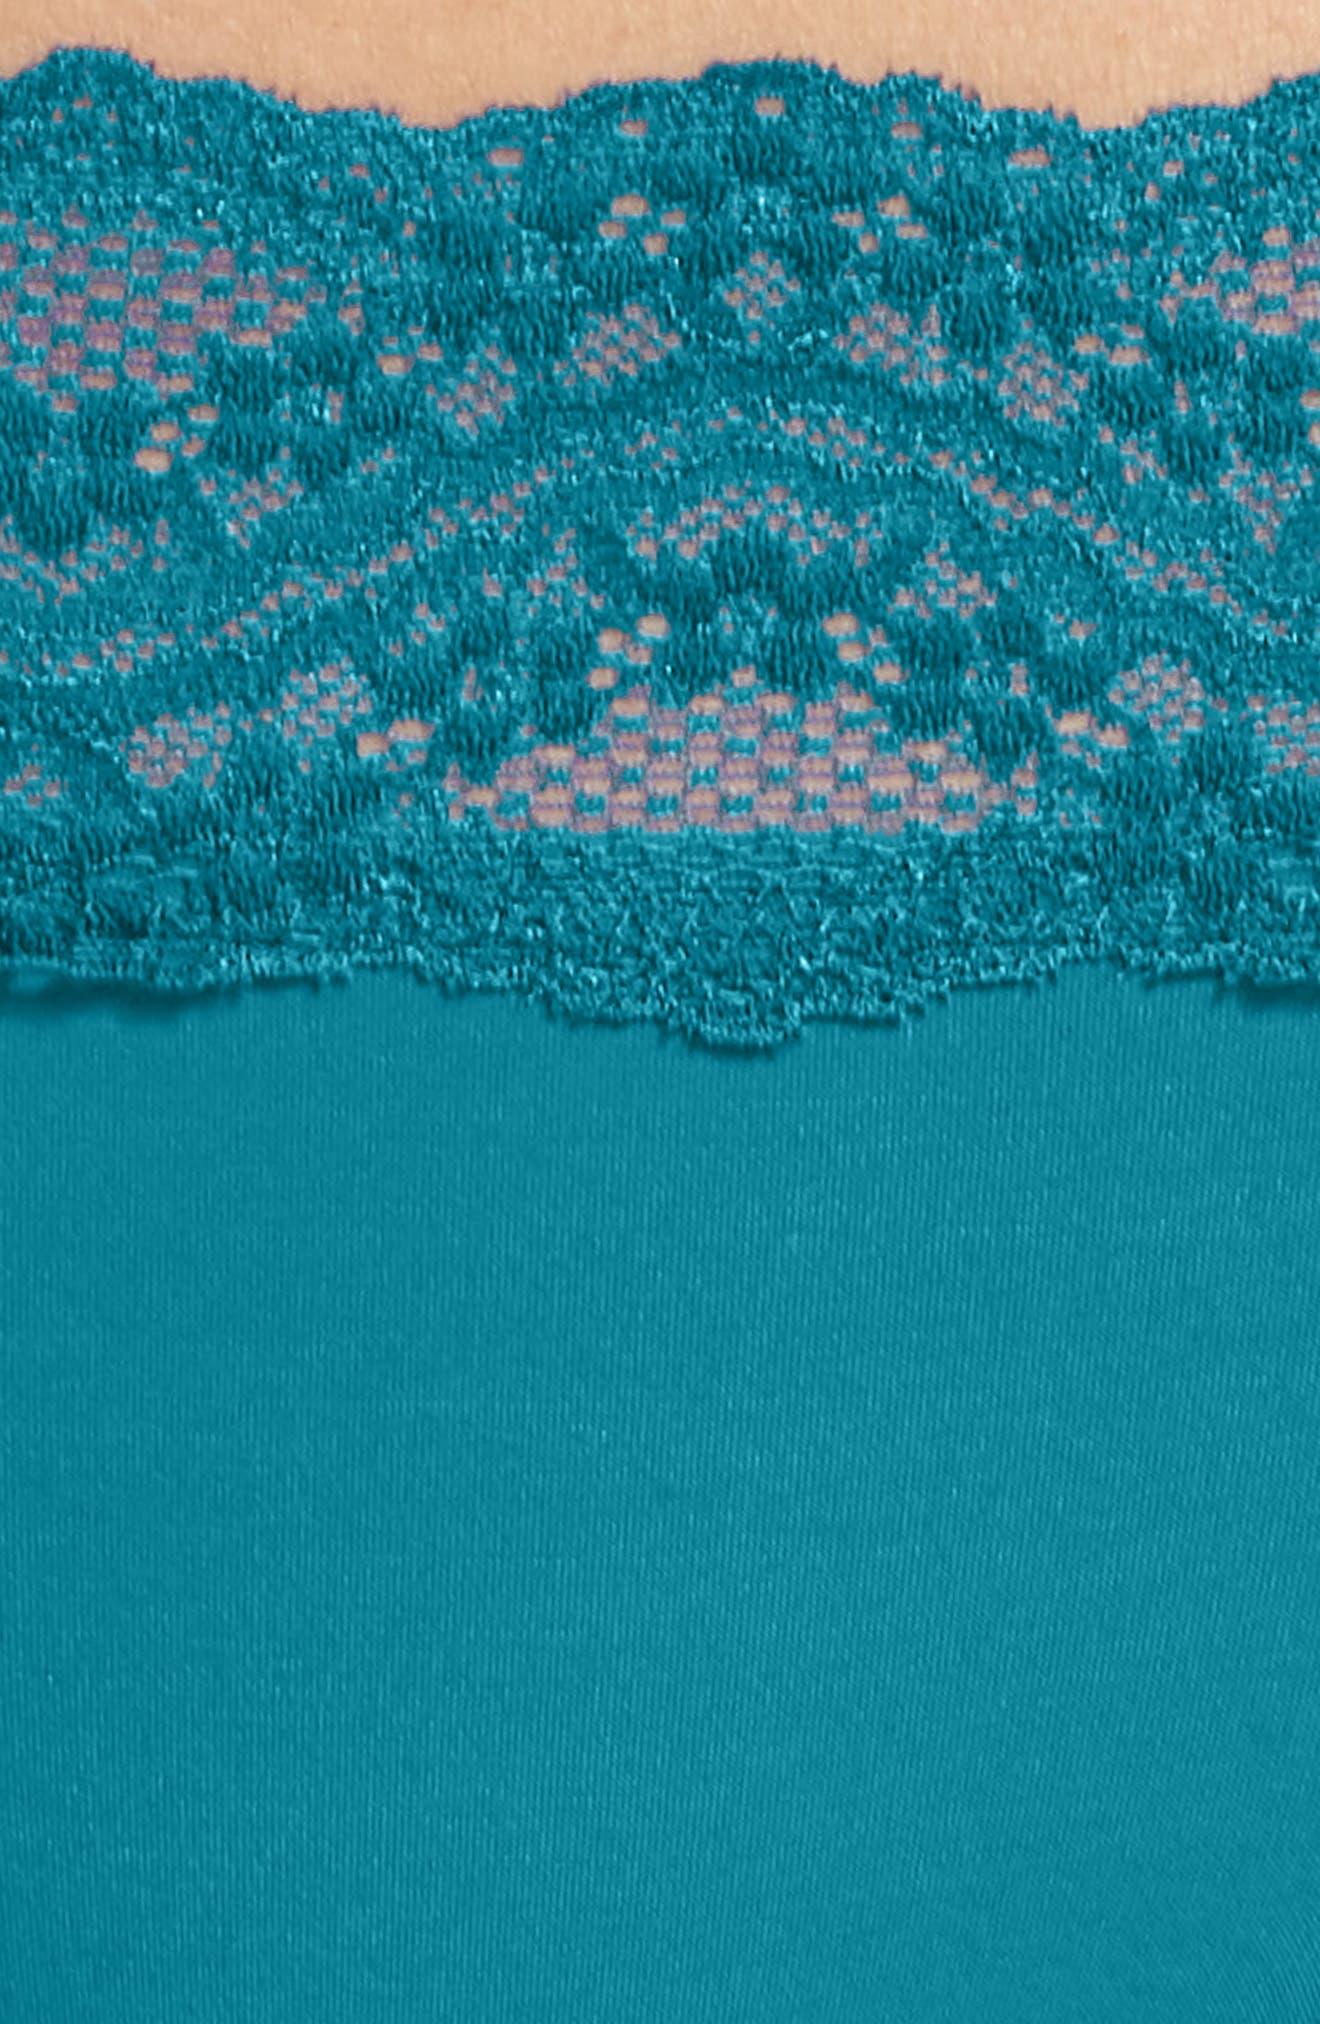 b.bare Hipster Panties,                             Alternate thumbnail 5, color,                             447